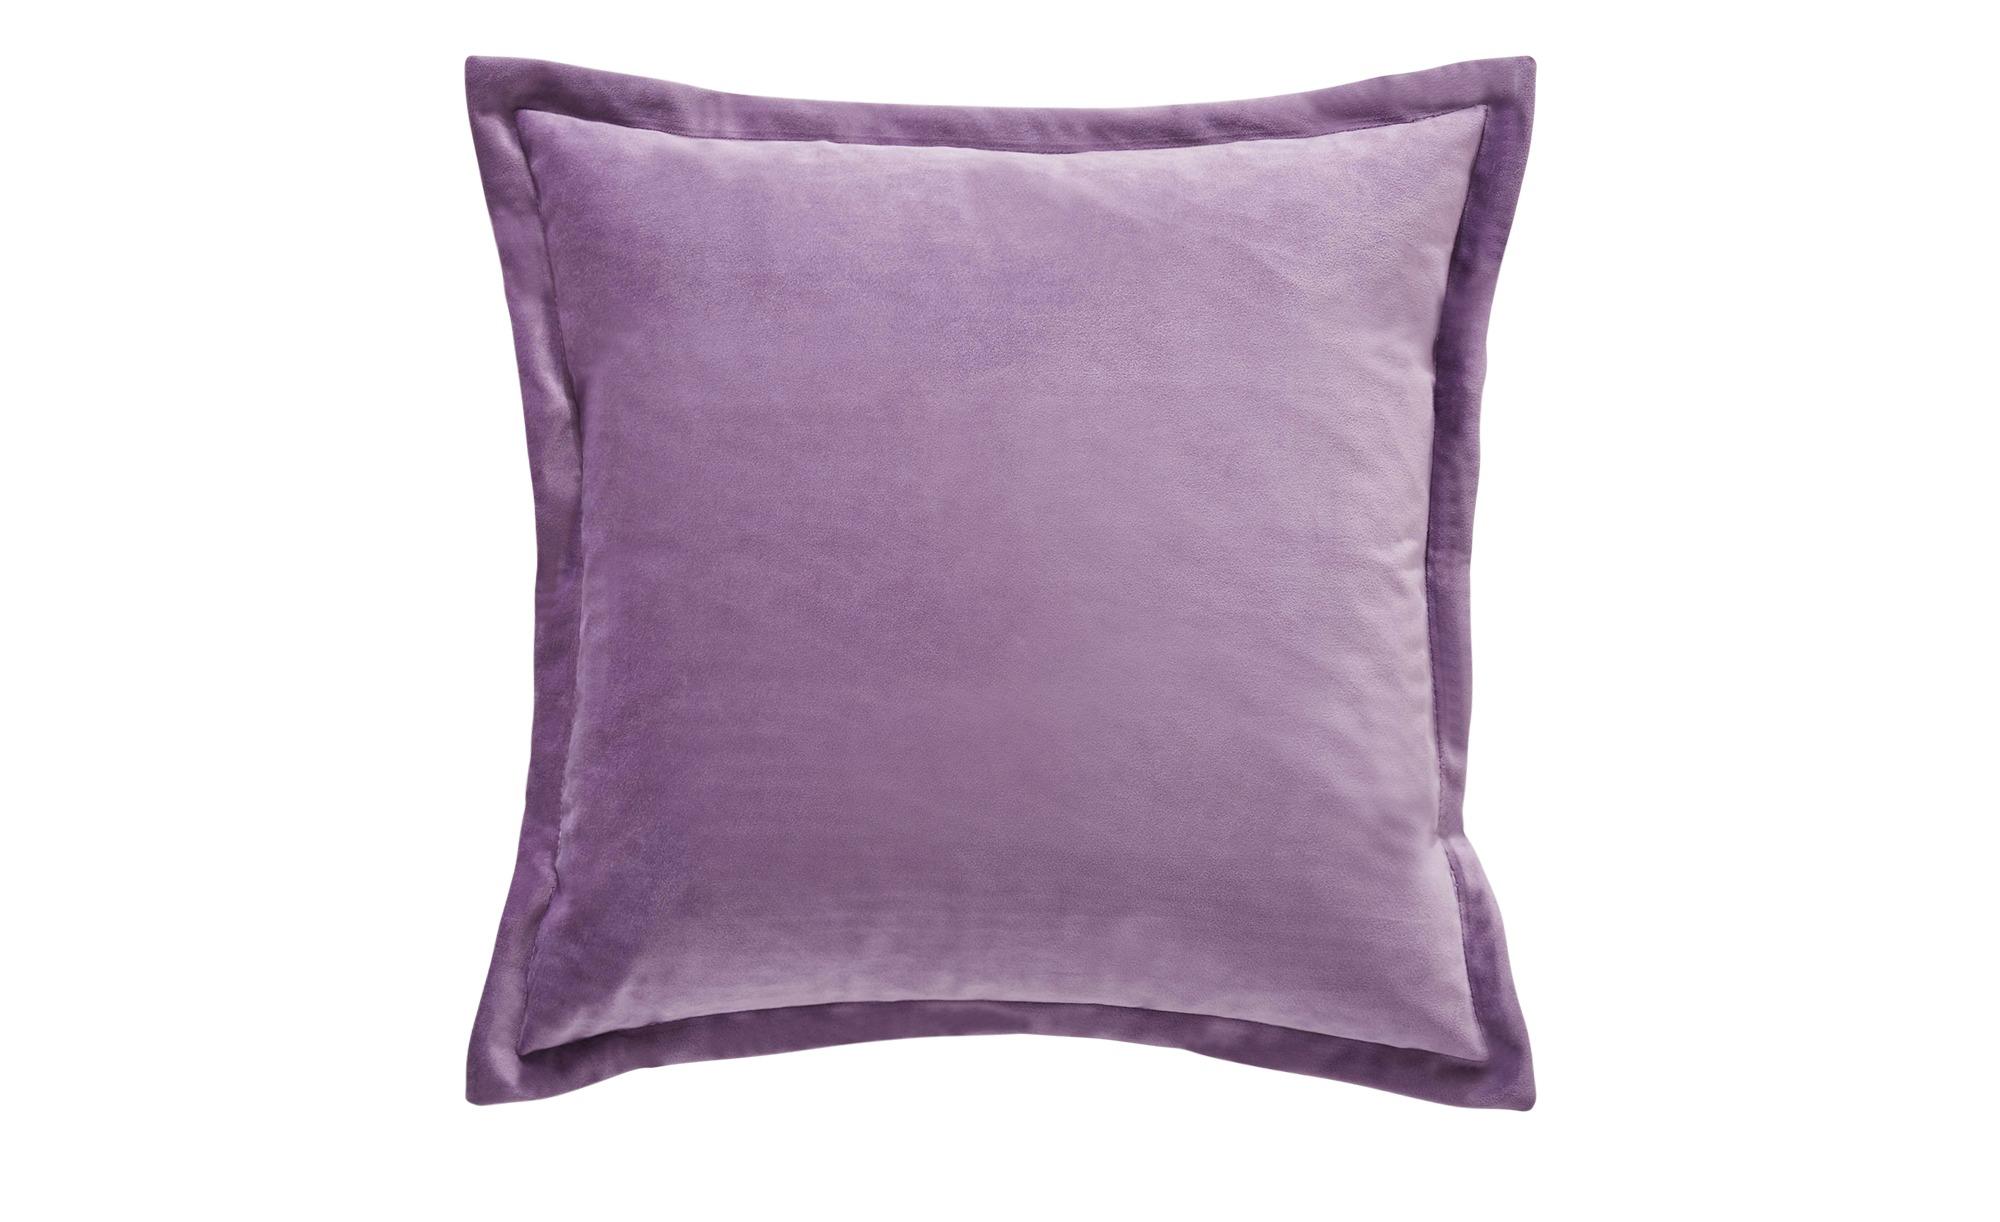 HOME STORY Kissen  Charlotte ¦ lila/violett ¦ Samt ¦ Maße (cm): B: 45 H: 2,5 T: 2,5 Heimtextilien > Kissen > Dekokissen - Höffner